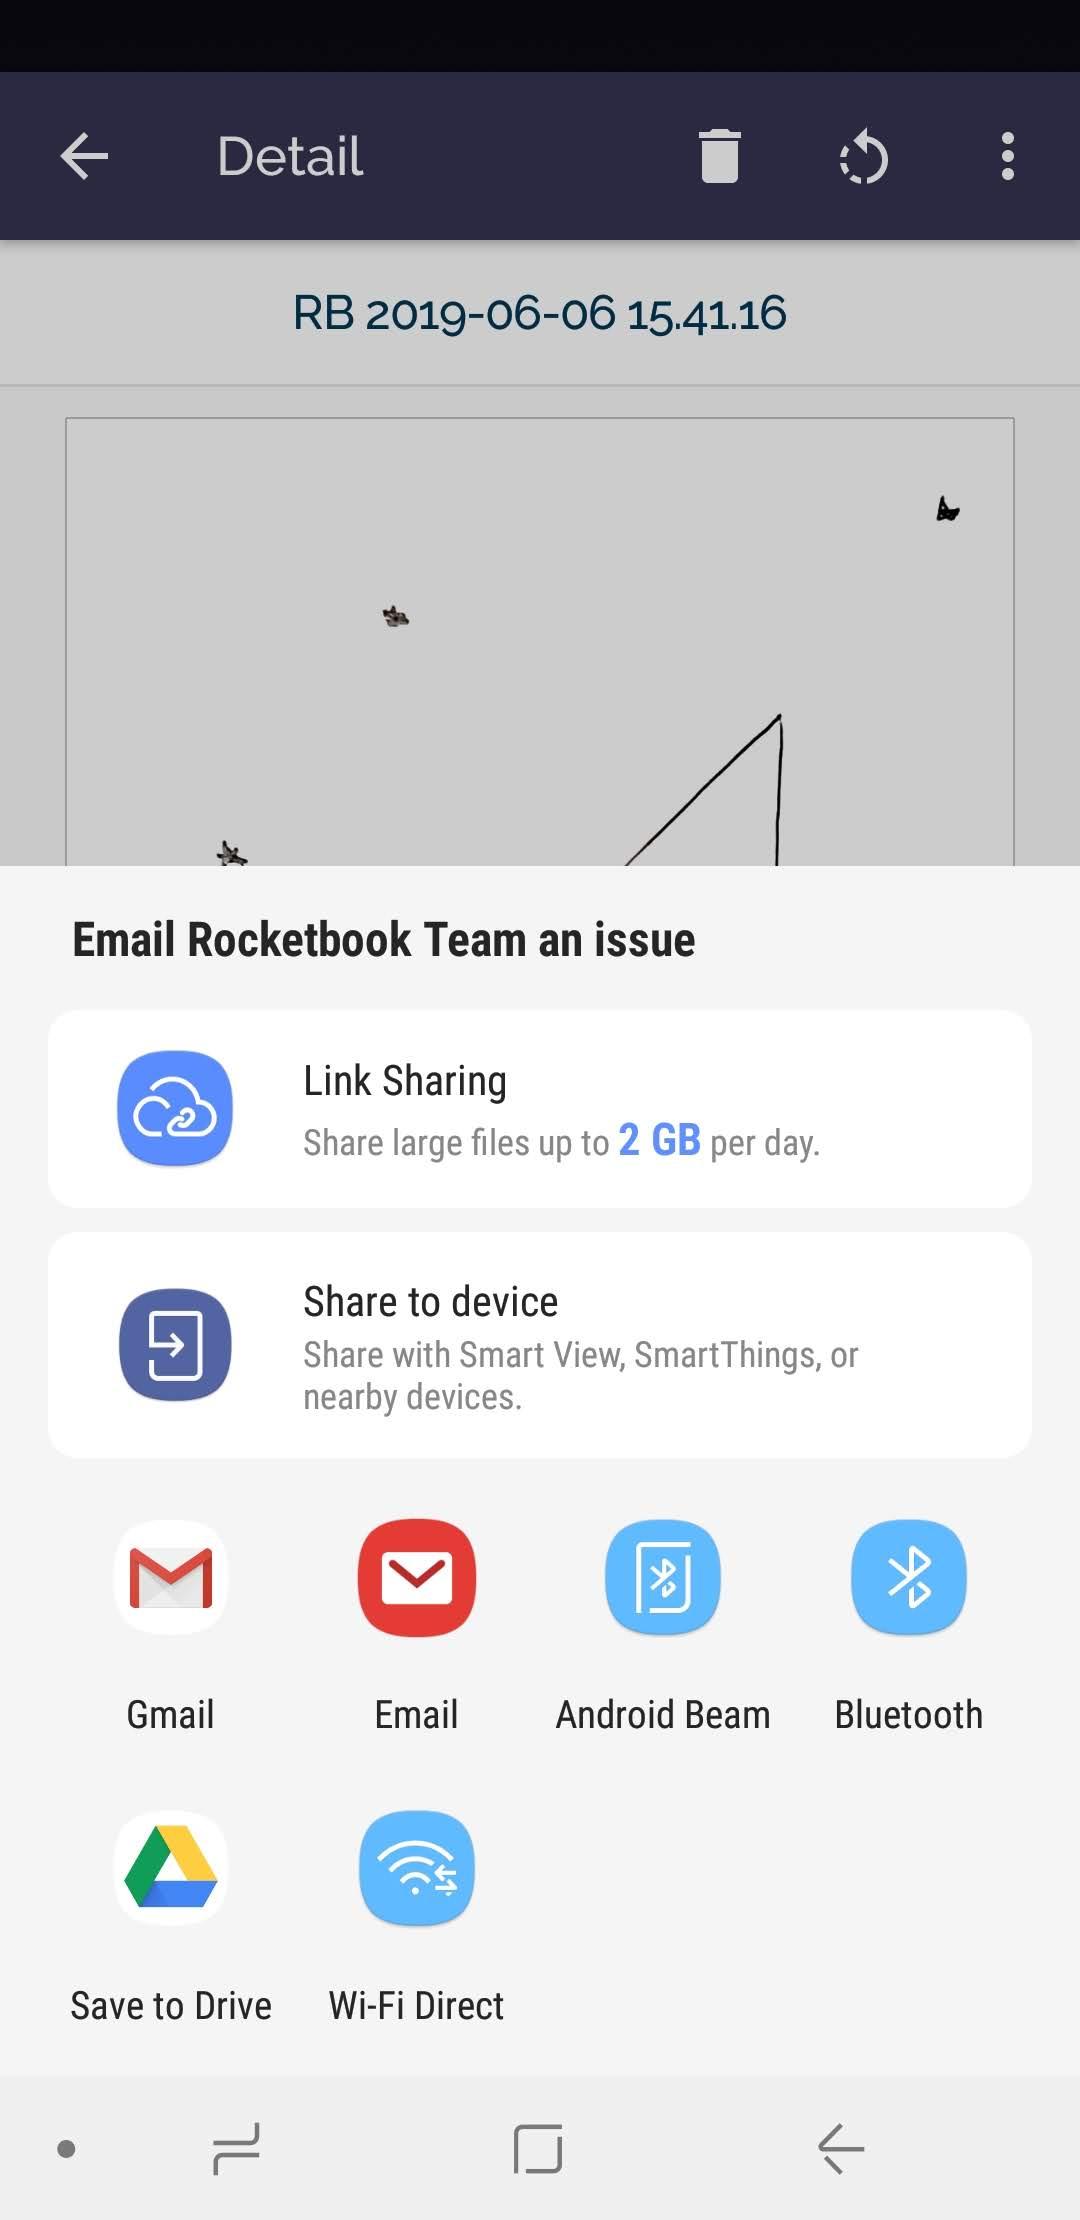 How to Send Scan Feedback – Rocketbook Help Center